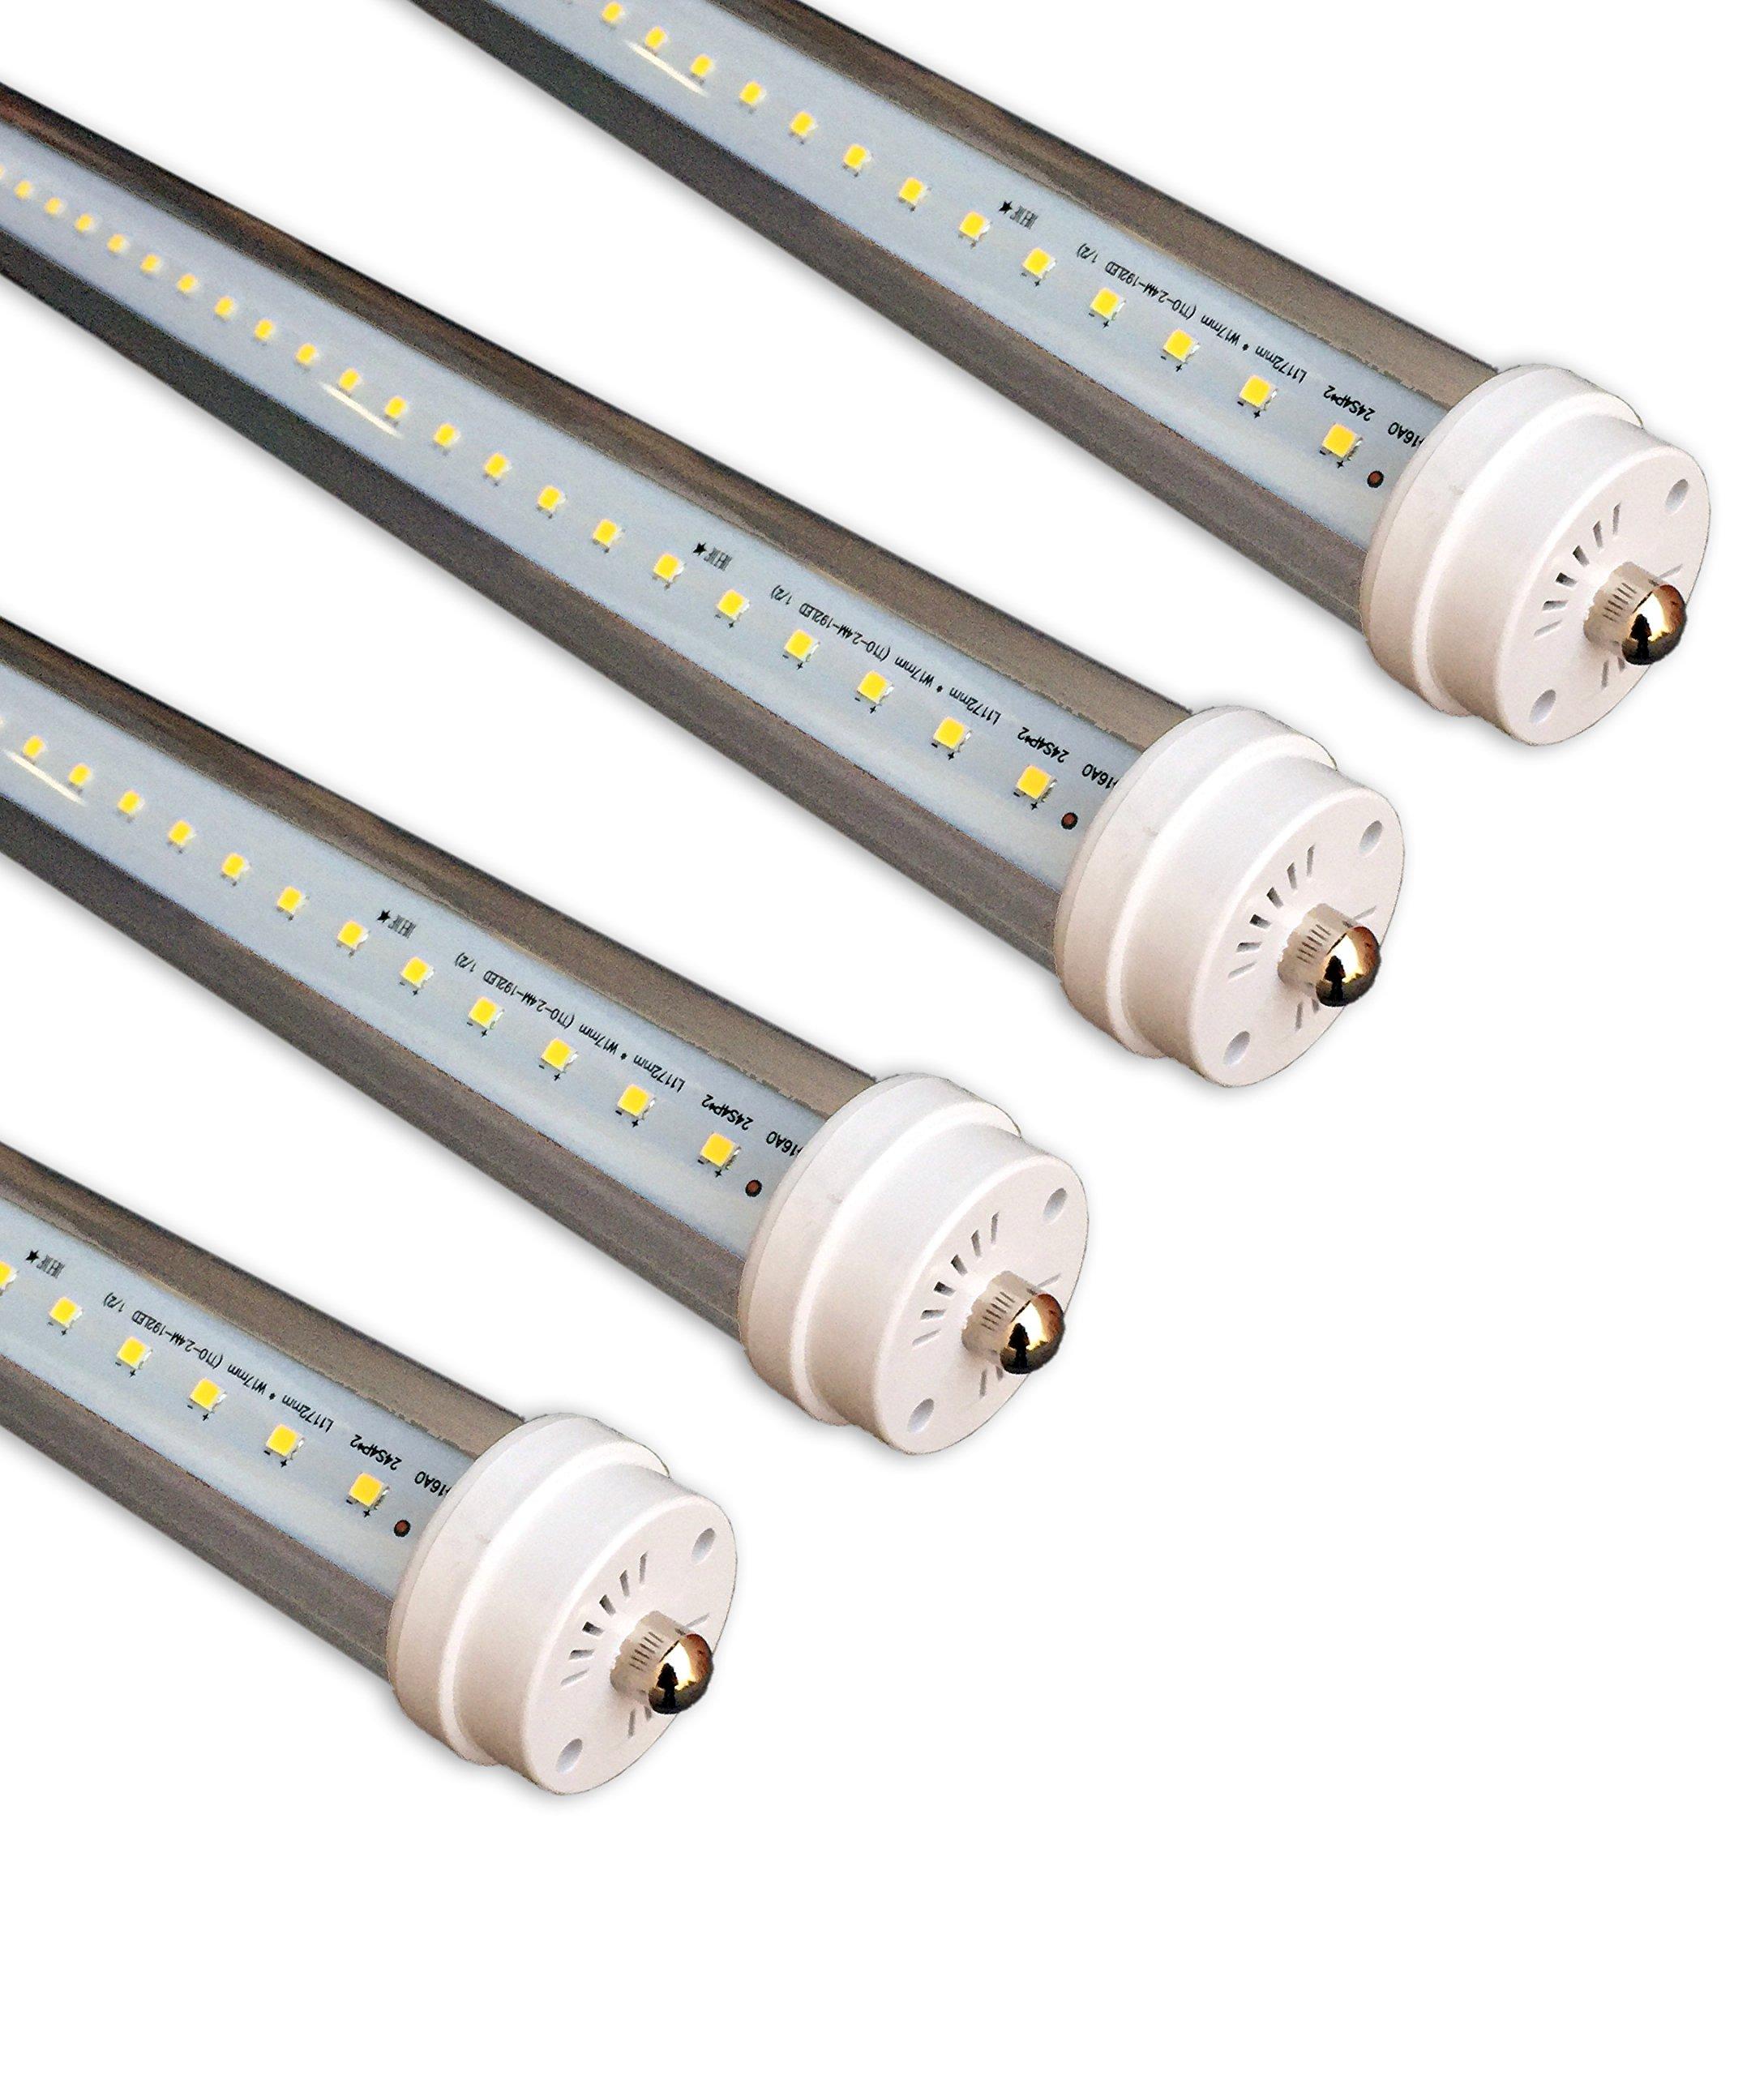 T12 Led Lights